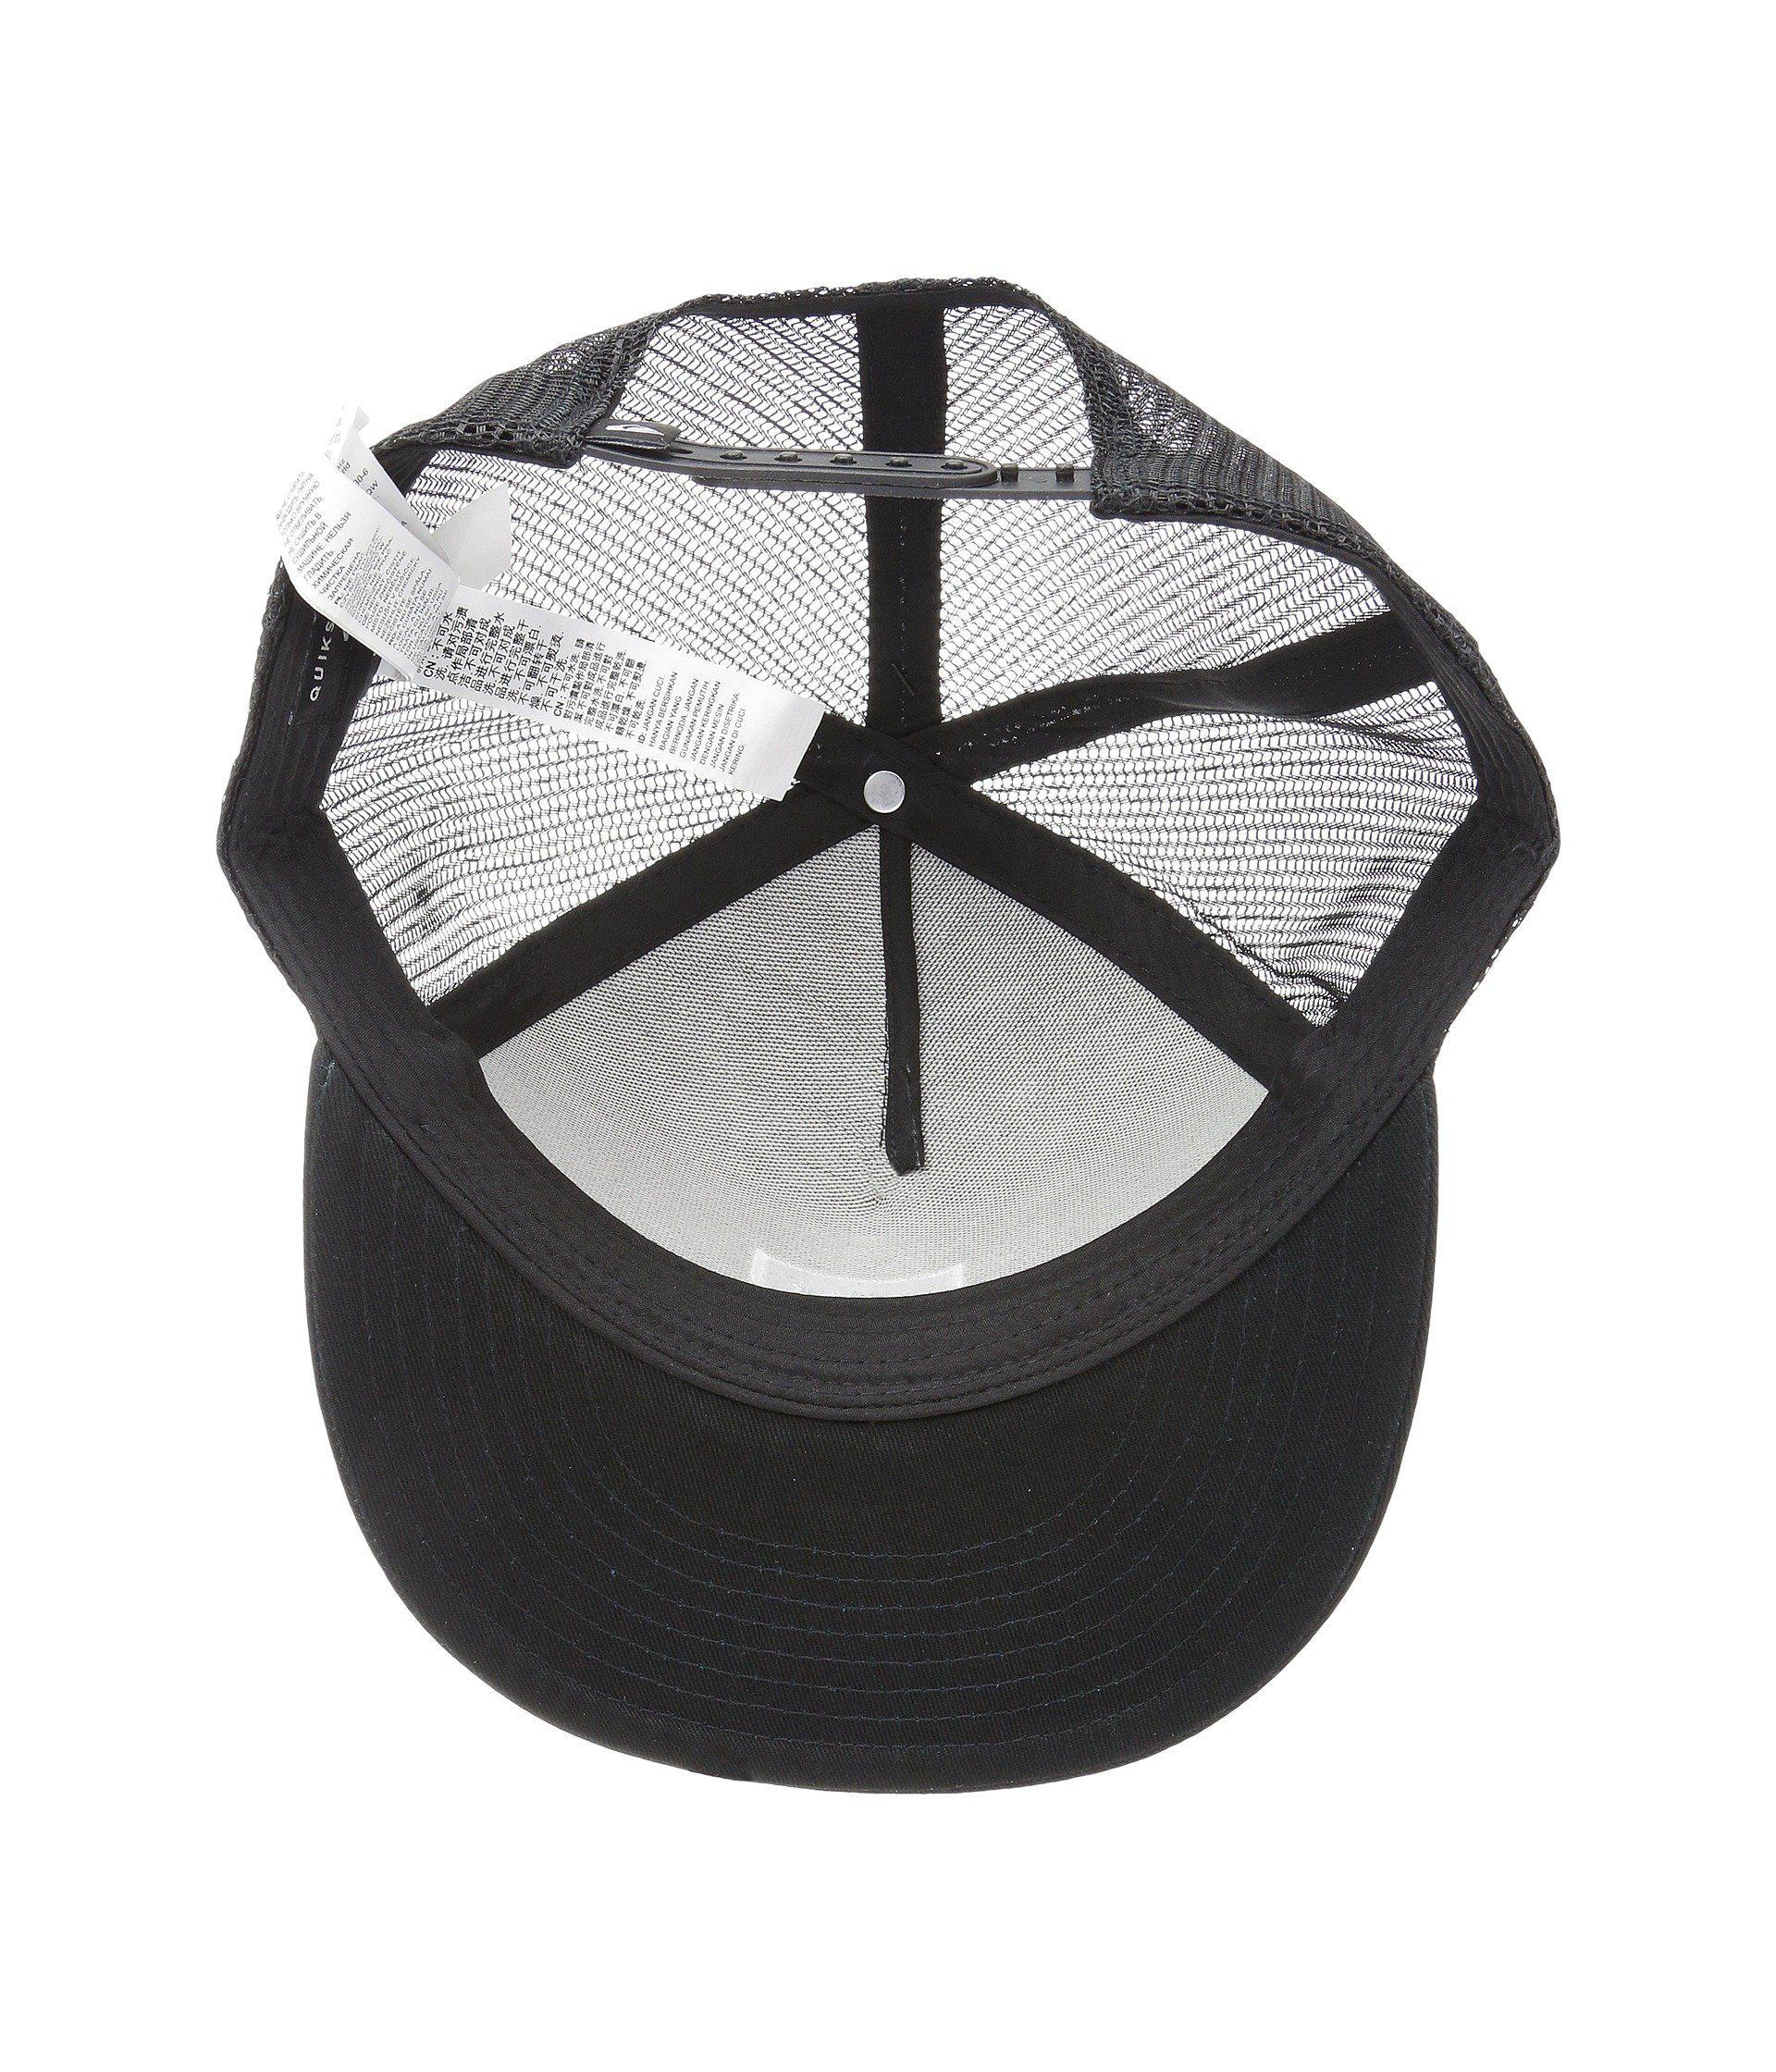 b8318fd0c5c5e Lyst - Quiksilver Clip Charger Cap (dark Forest) Baseball Caps in Black for  Men